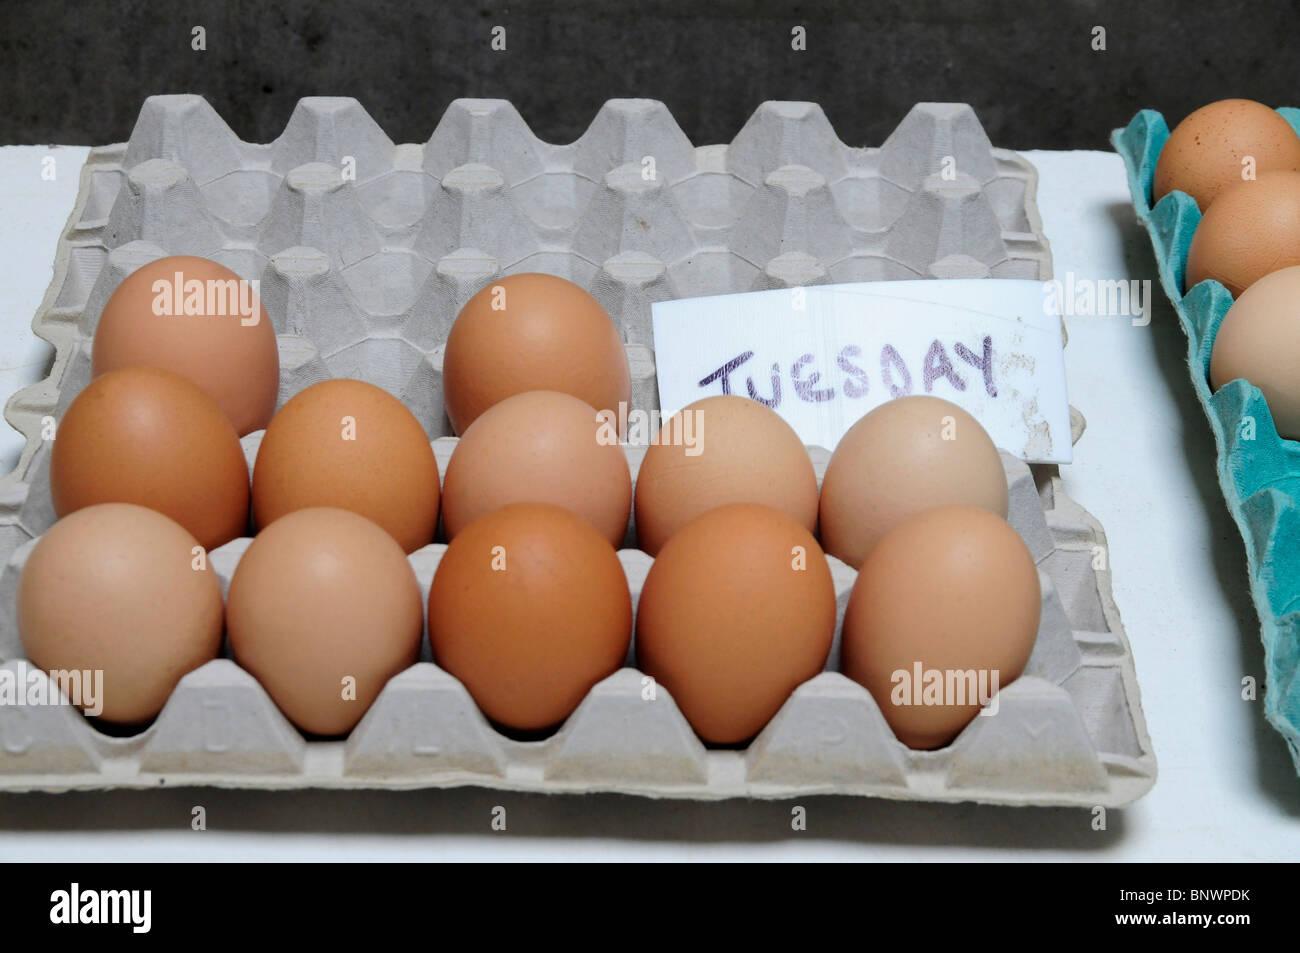 Eggs in Carton - Stock Image